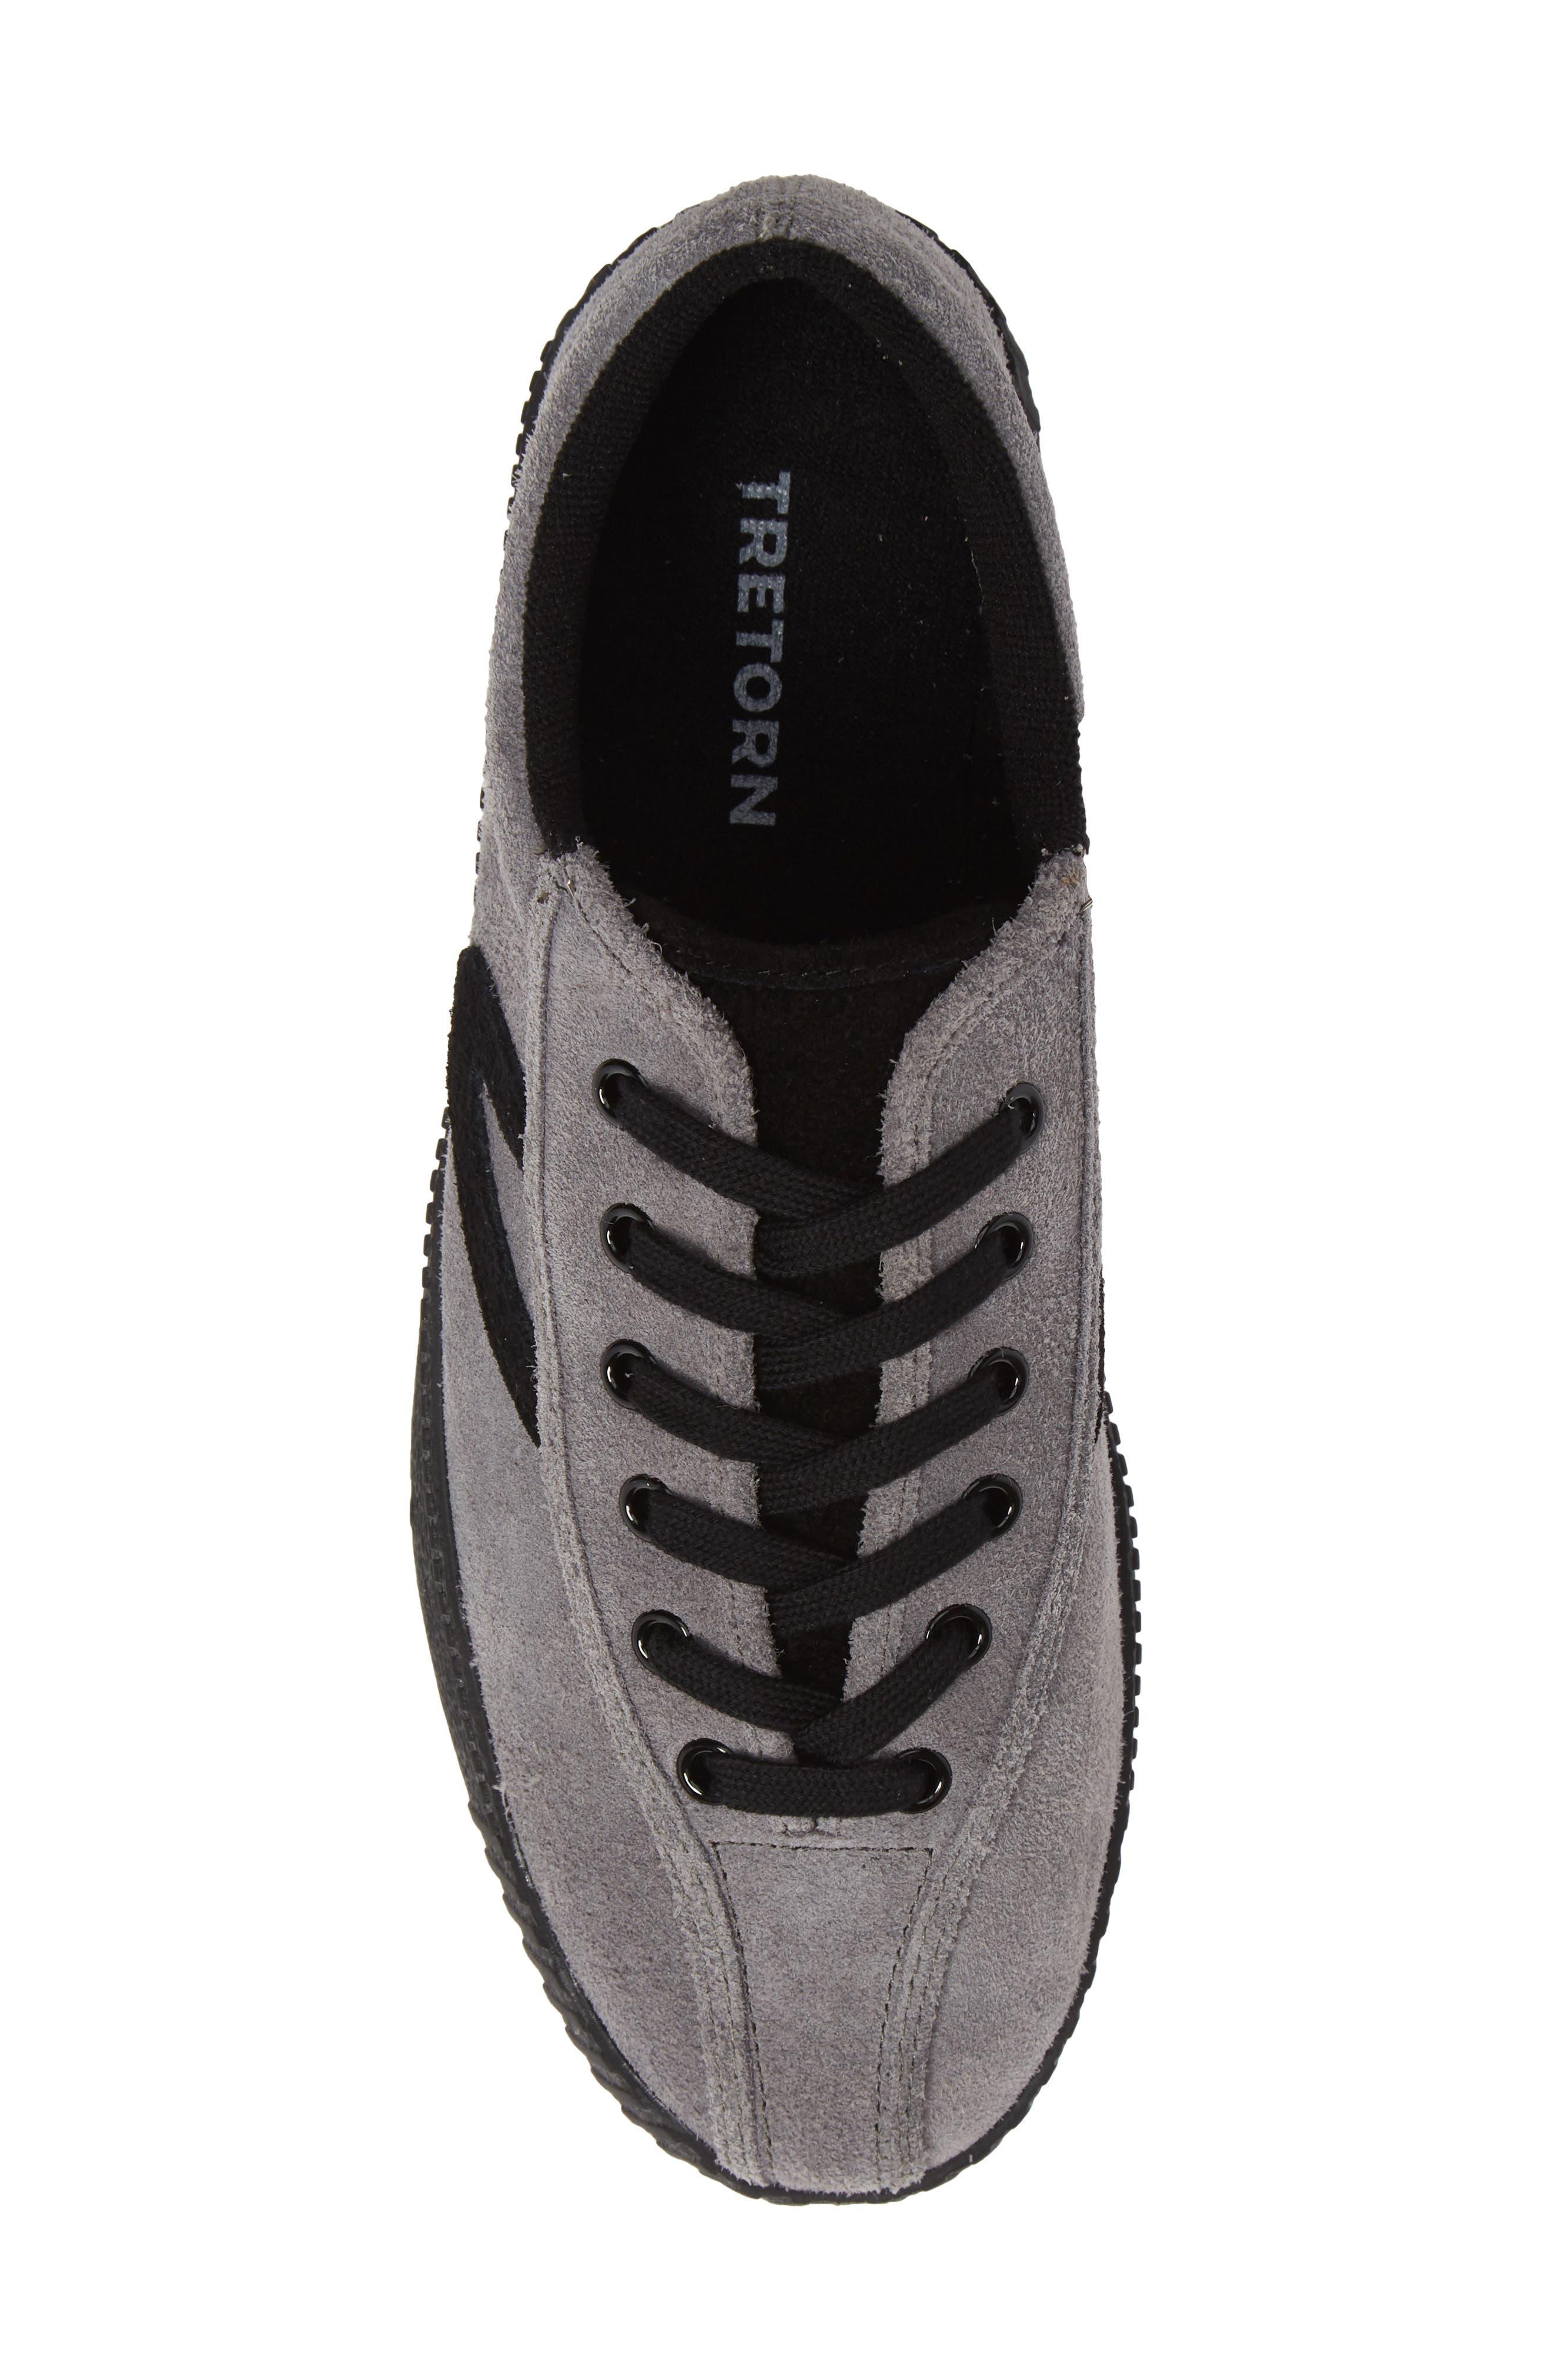 Nylite26Plus Sneaker,                             Alternate thumbnail 5, color,                             GRAPHITE SUEDE